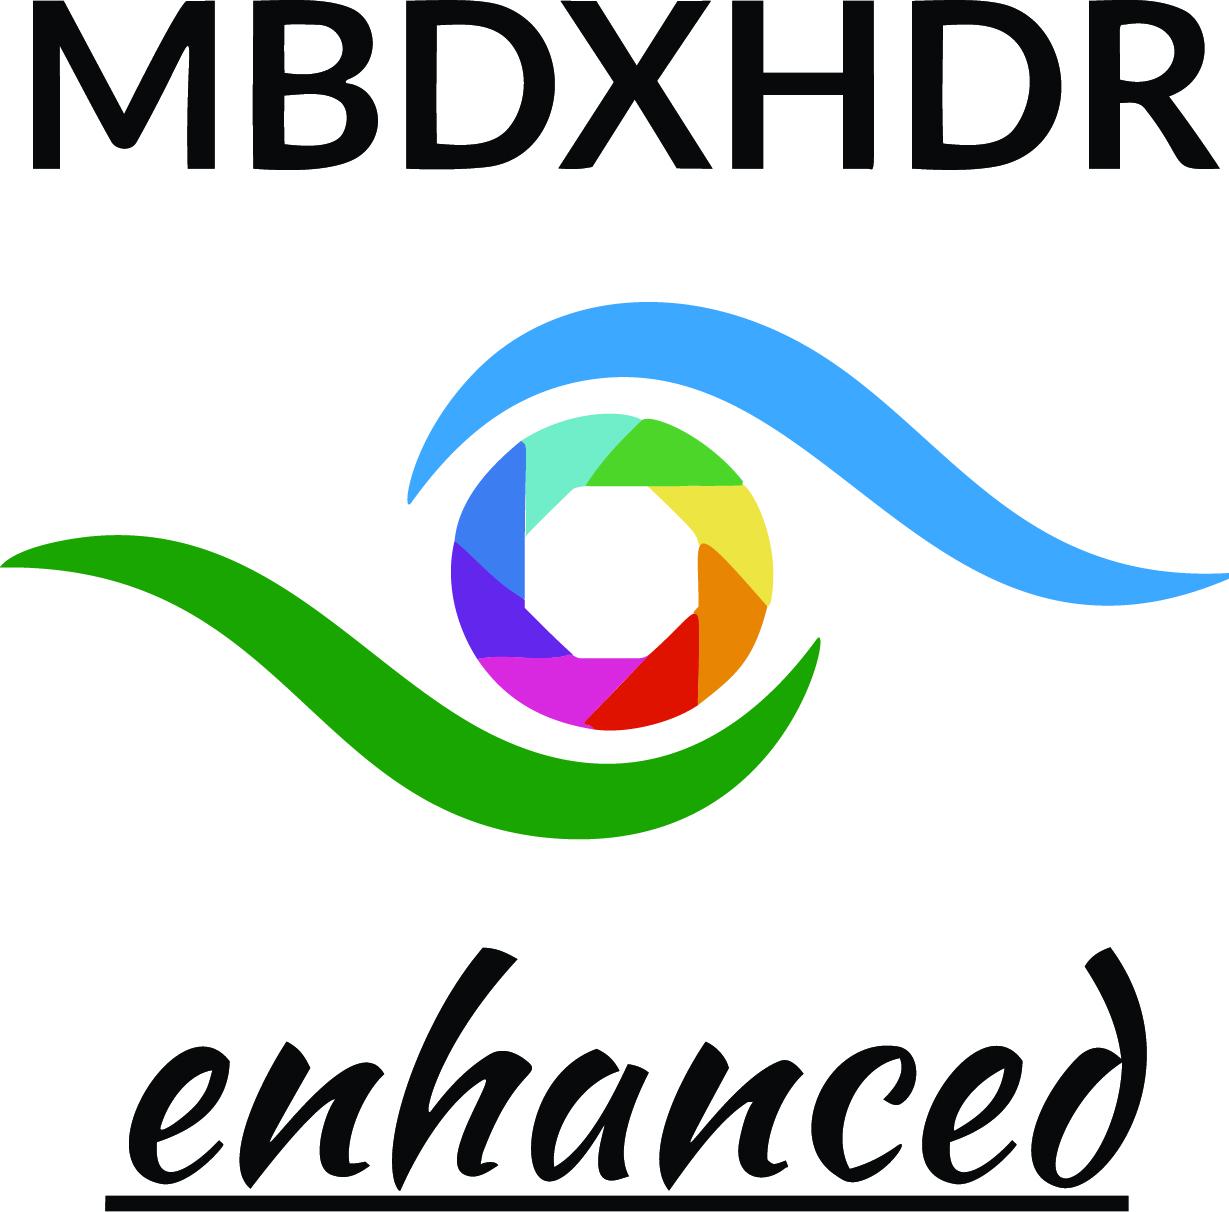 MBDXHDR